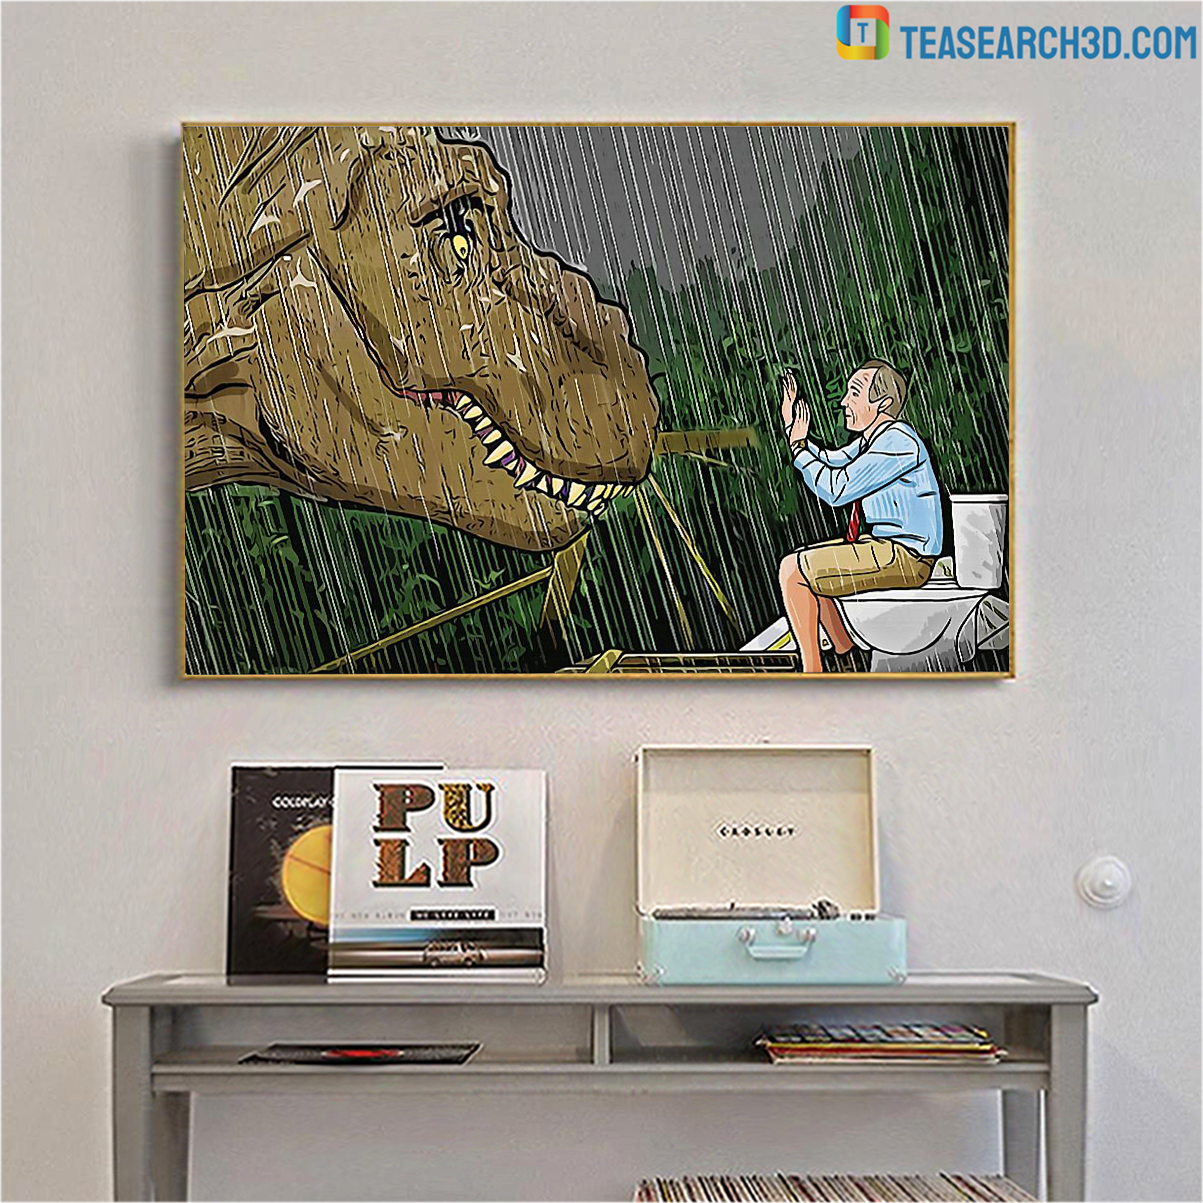 Jurassic park T-rex toilet scene canvas